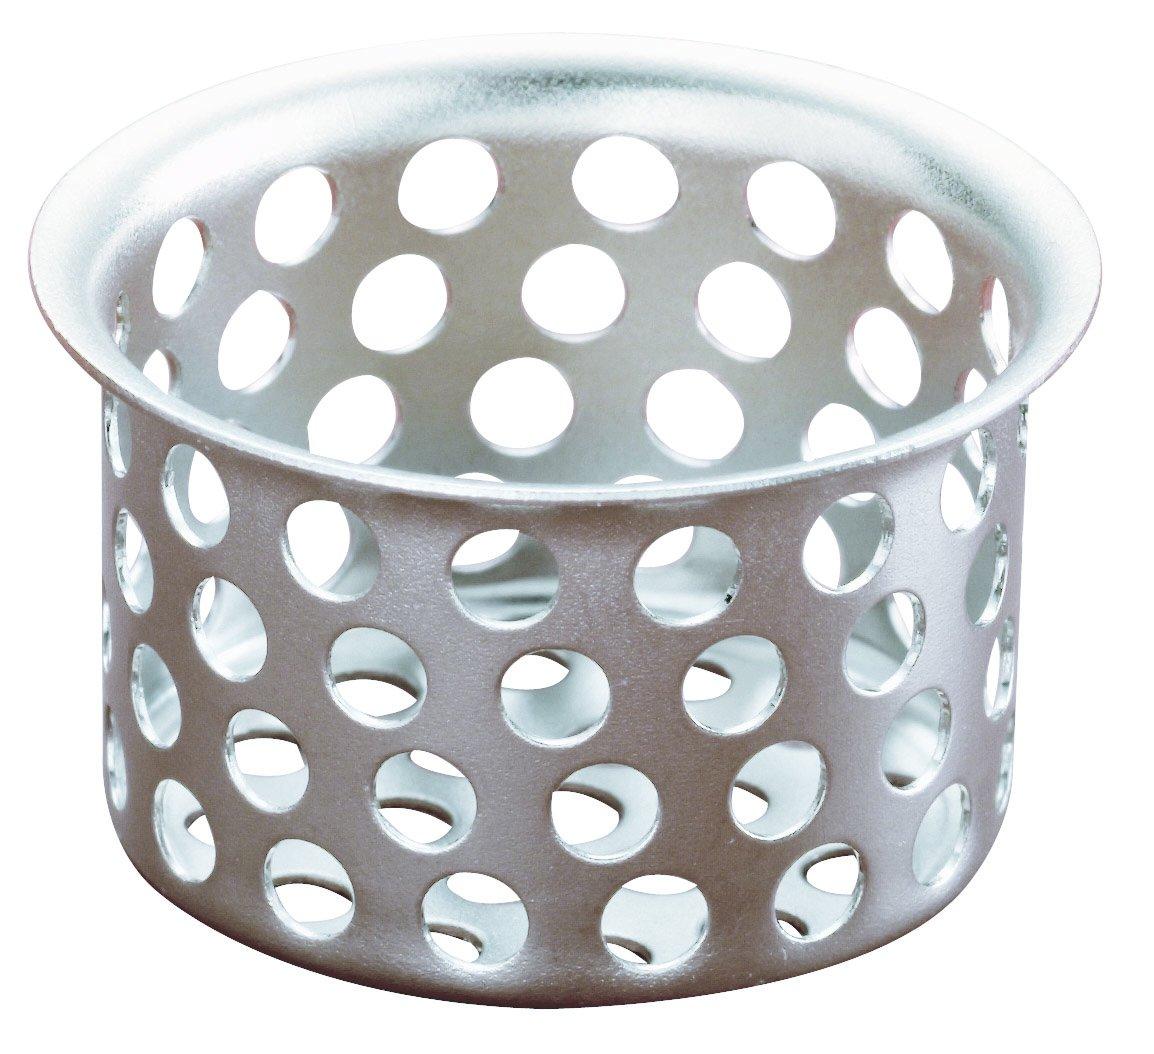 Keeney PP820-37 Strainer Basket-Basin Sink 1-inch 1 Pack Chrome